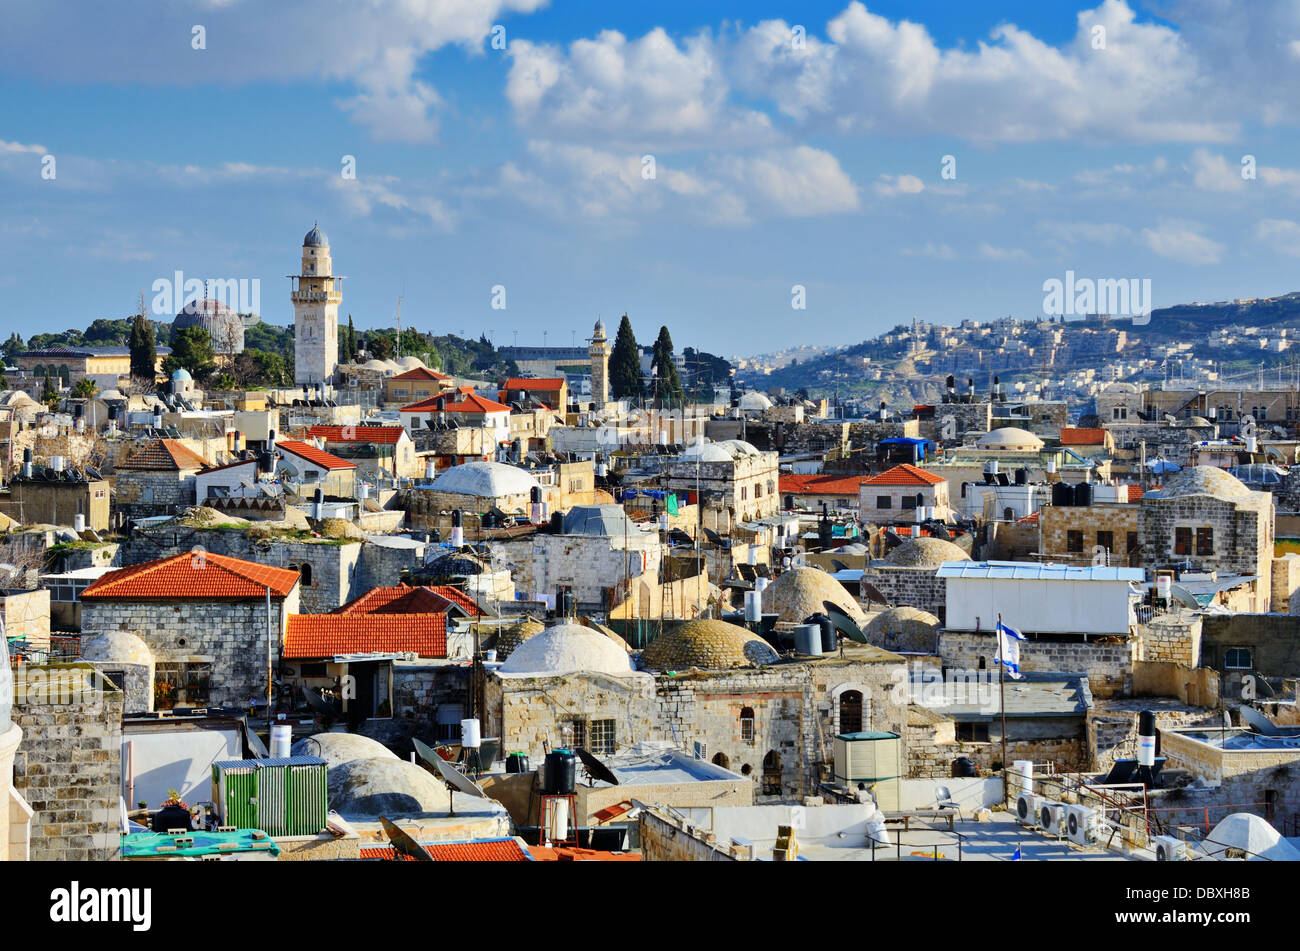 Skyline of the Old City in Jerusalem, Israel. - Stock Image